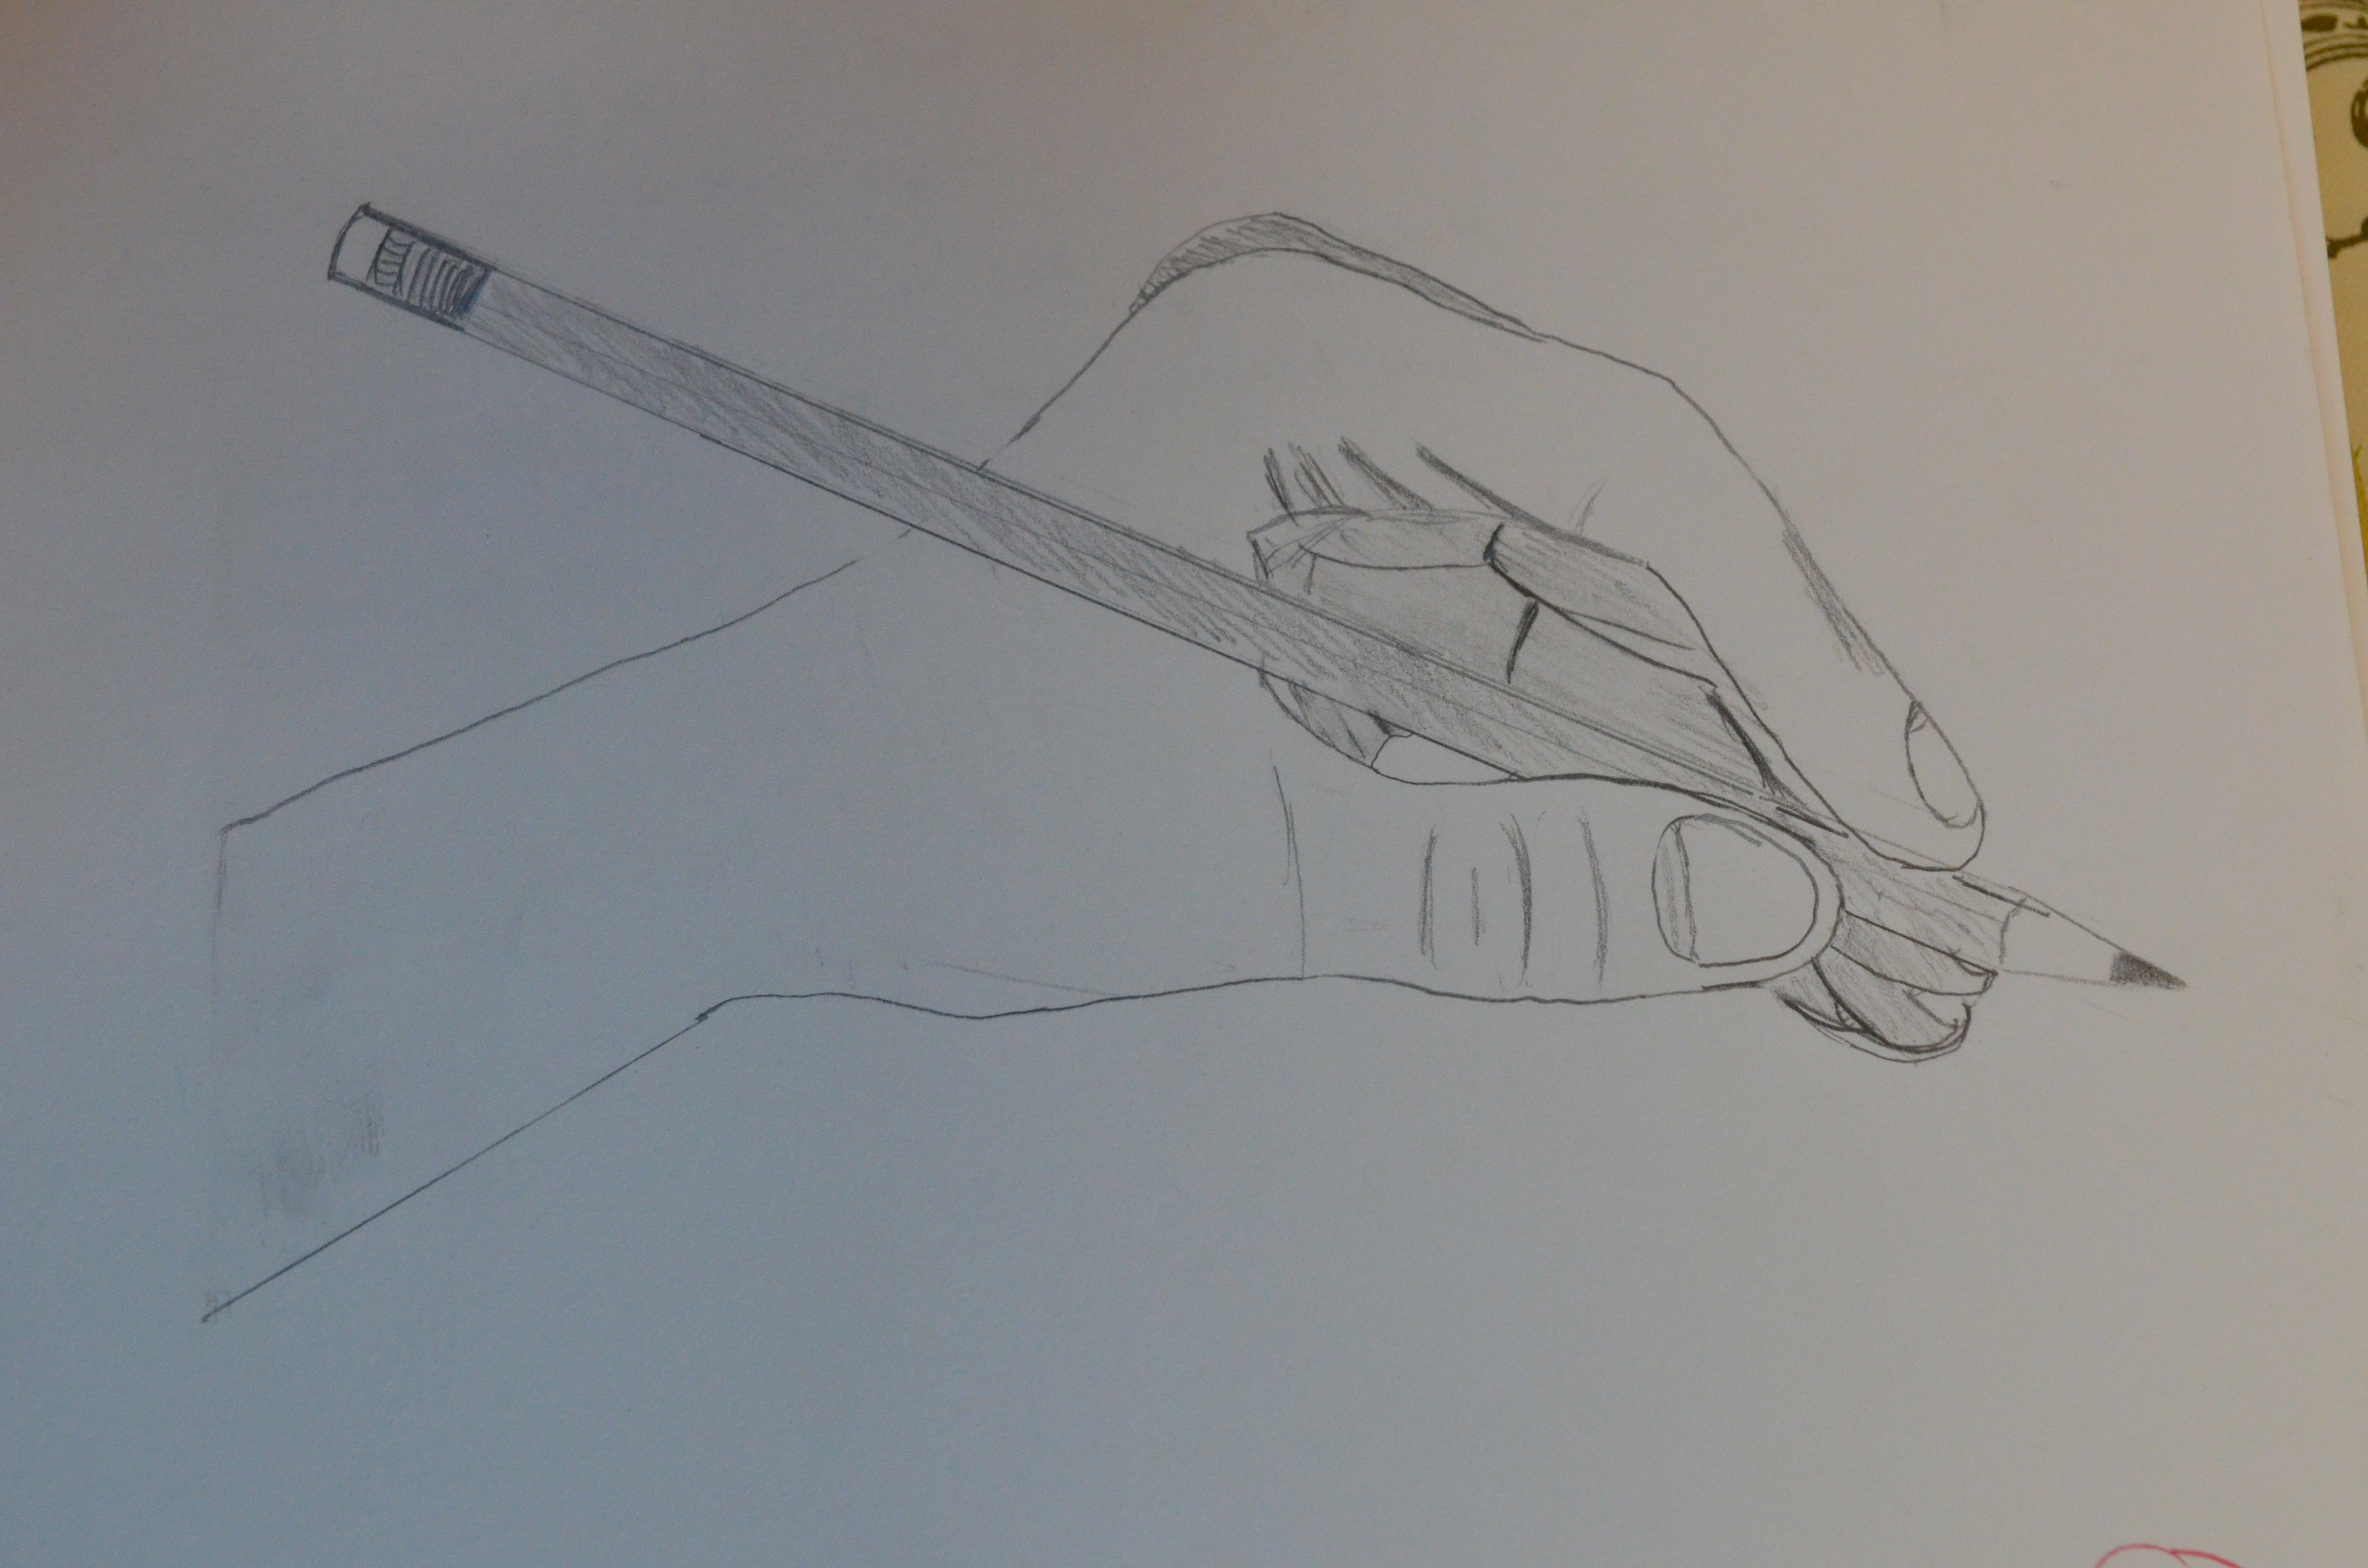 4928x3264 Sketchbook Assignment